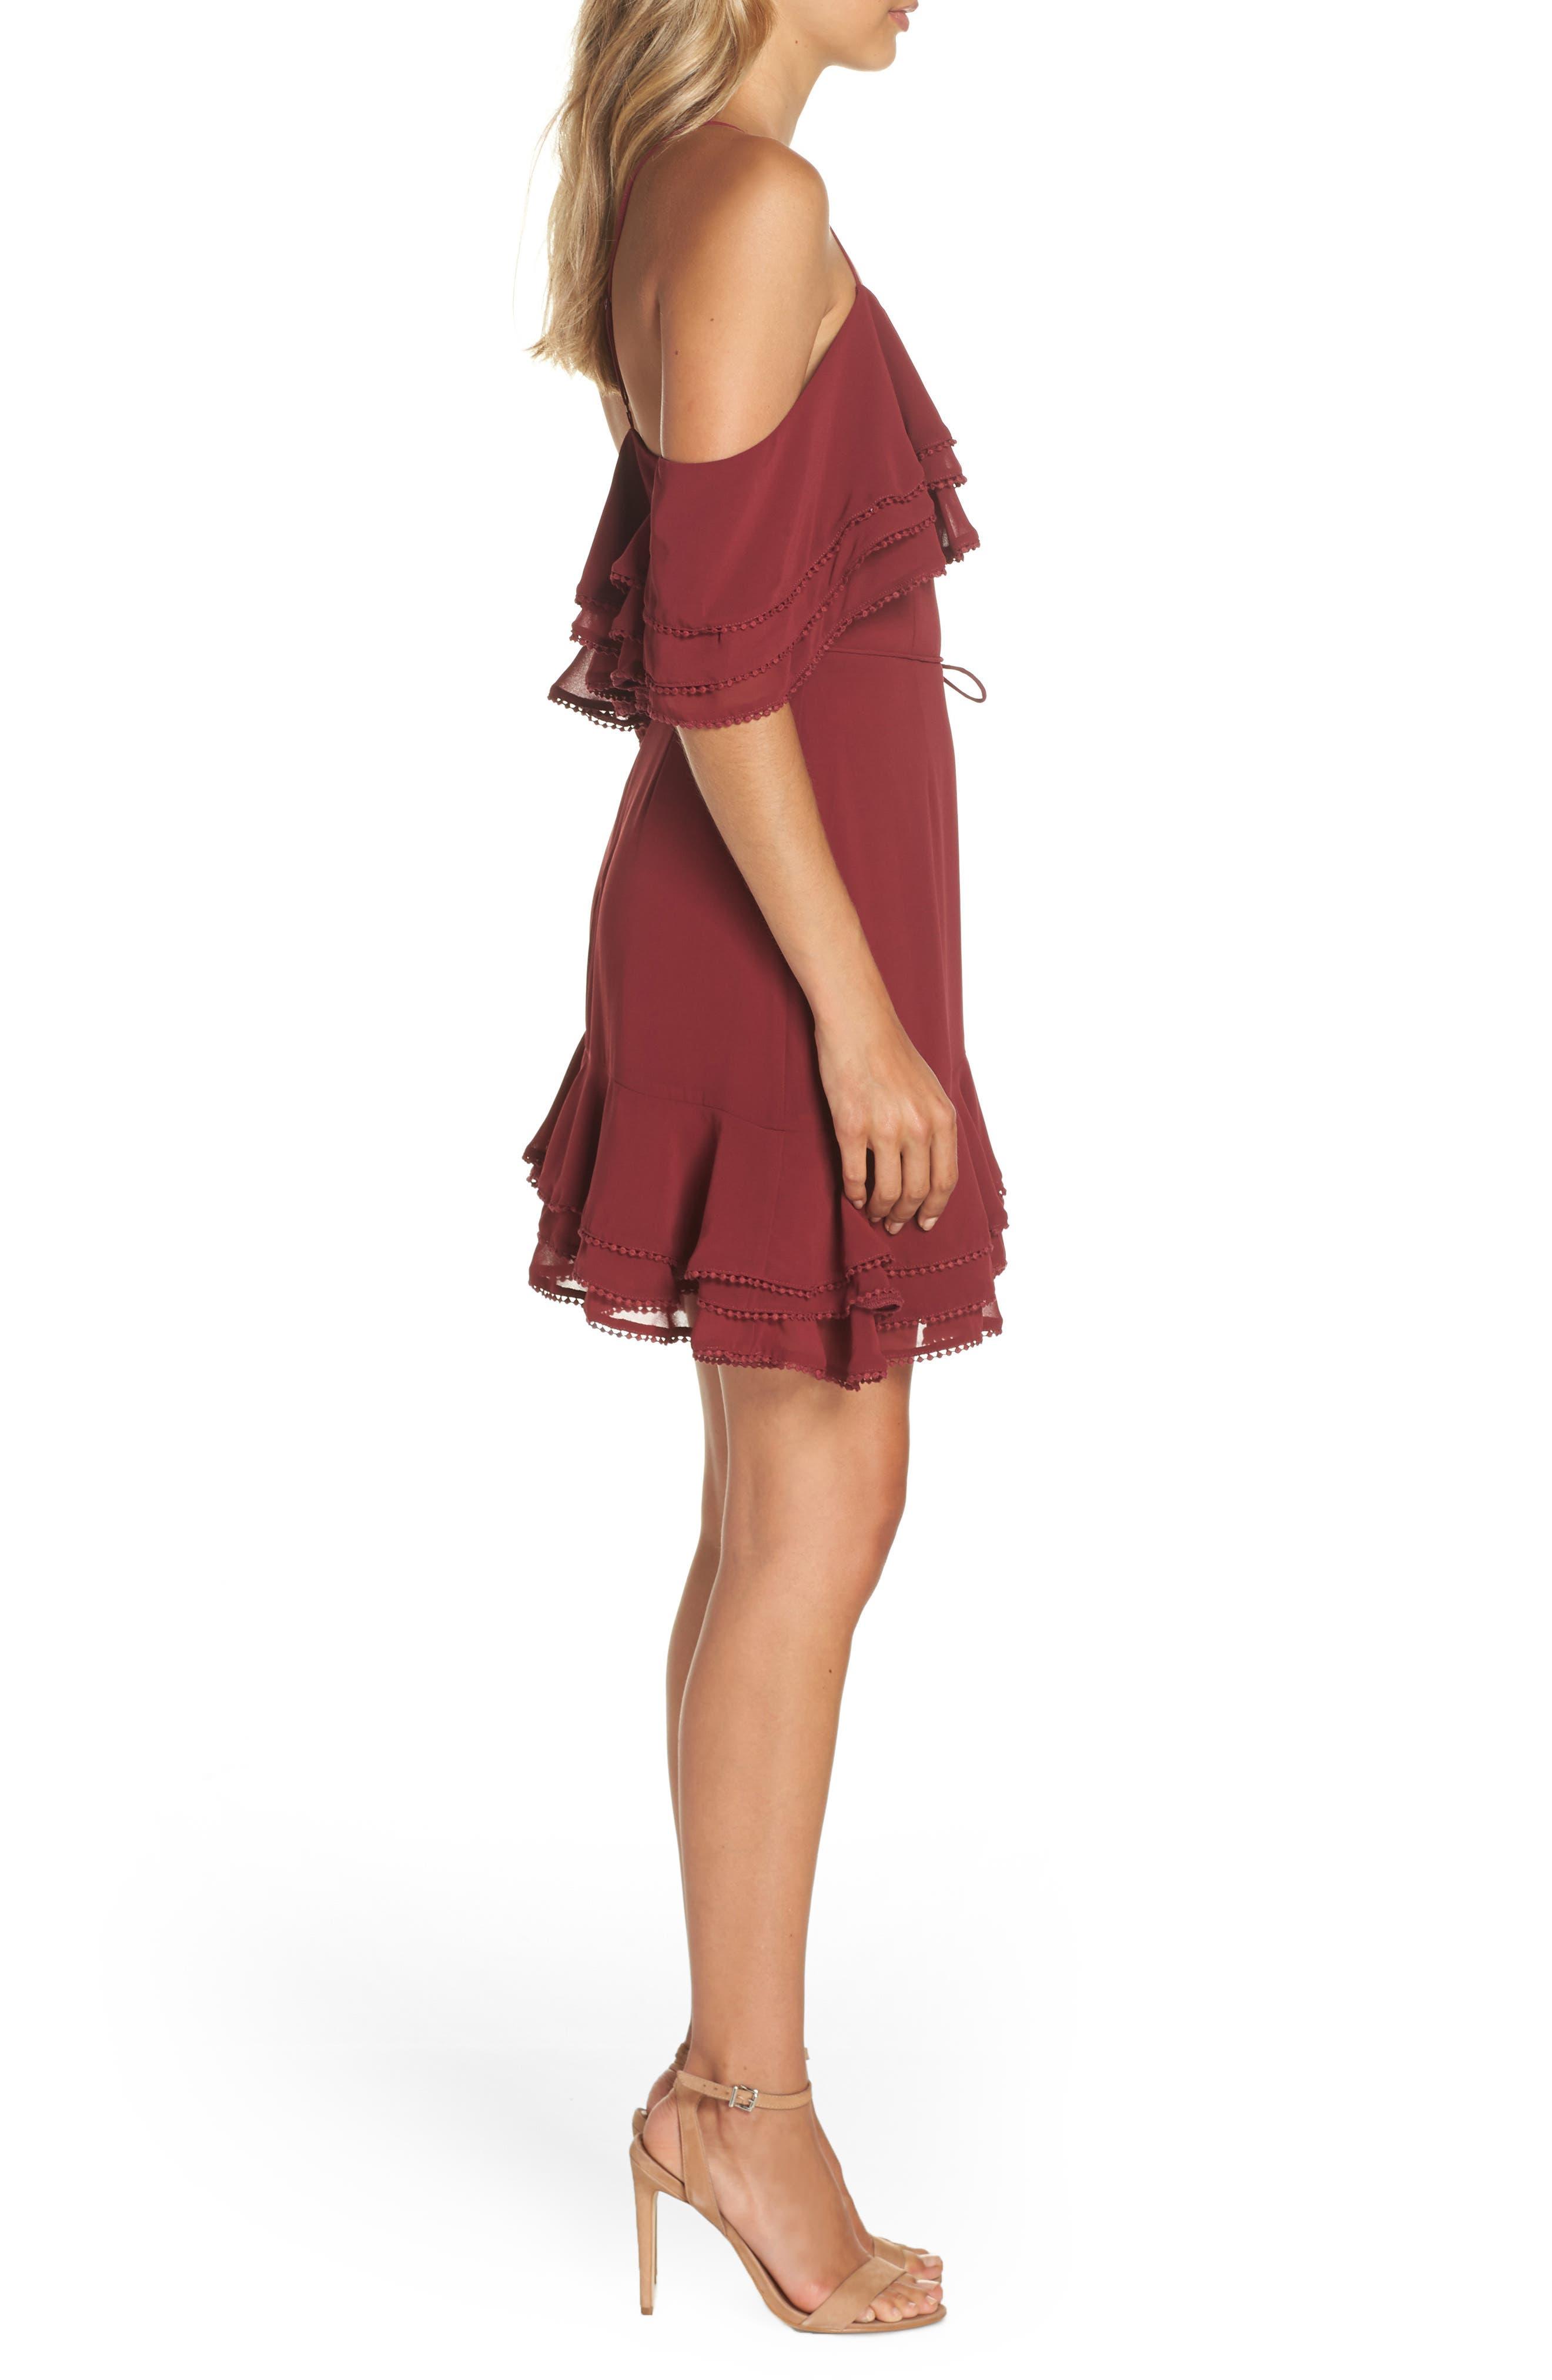 BB DAKOTA, Up All Night Layered Cold Shoulder Dress, Alternate thumbnail 4, color, 930